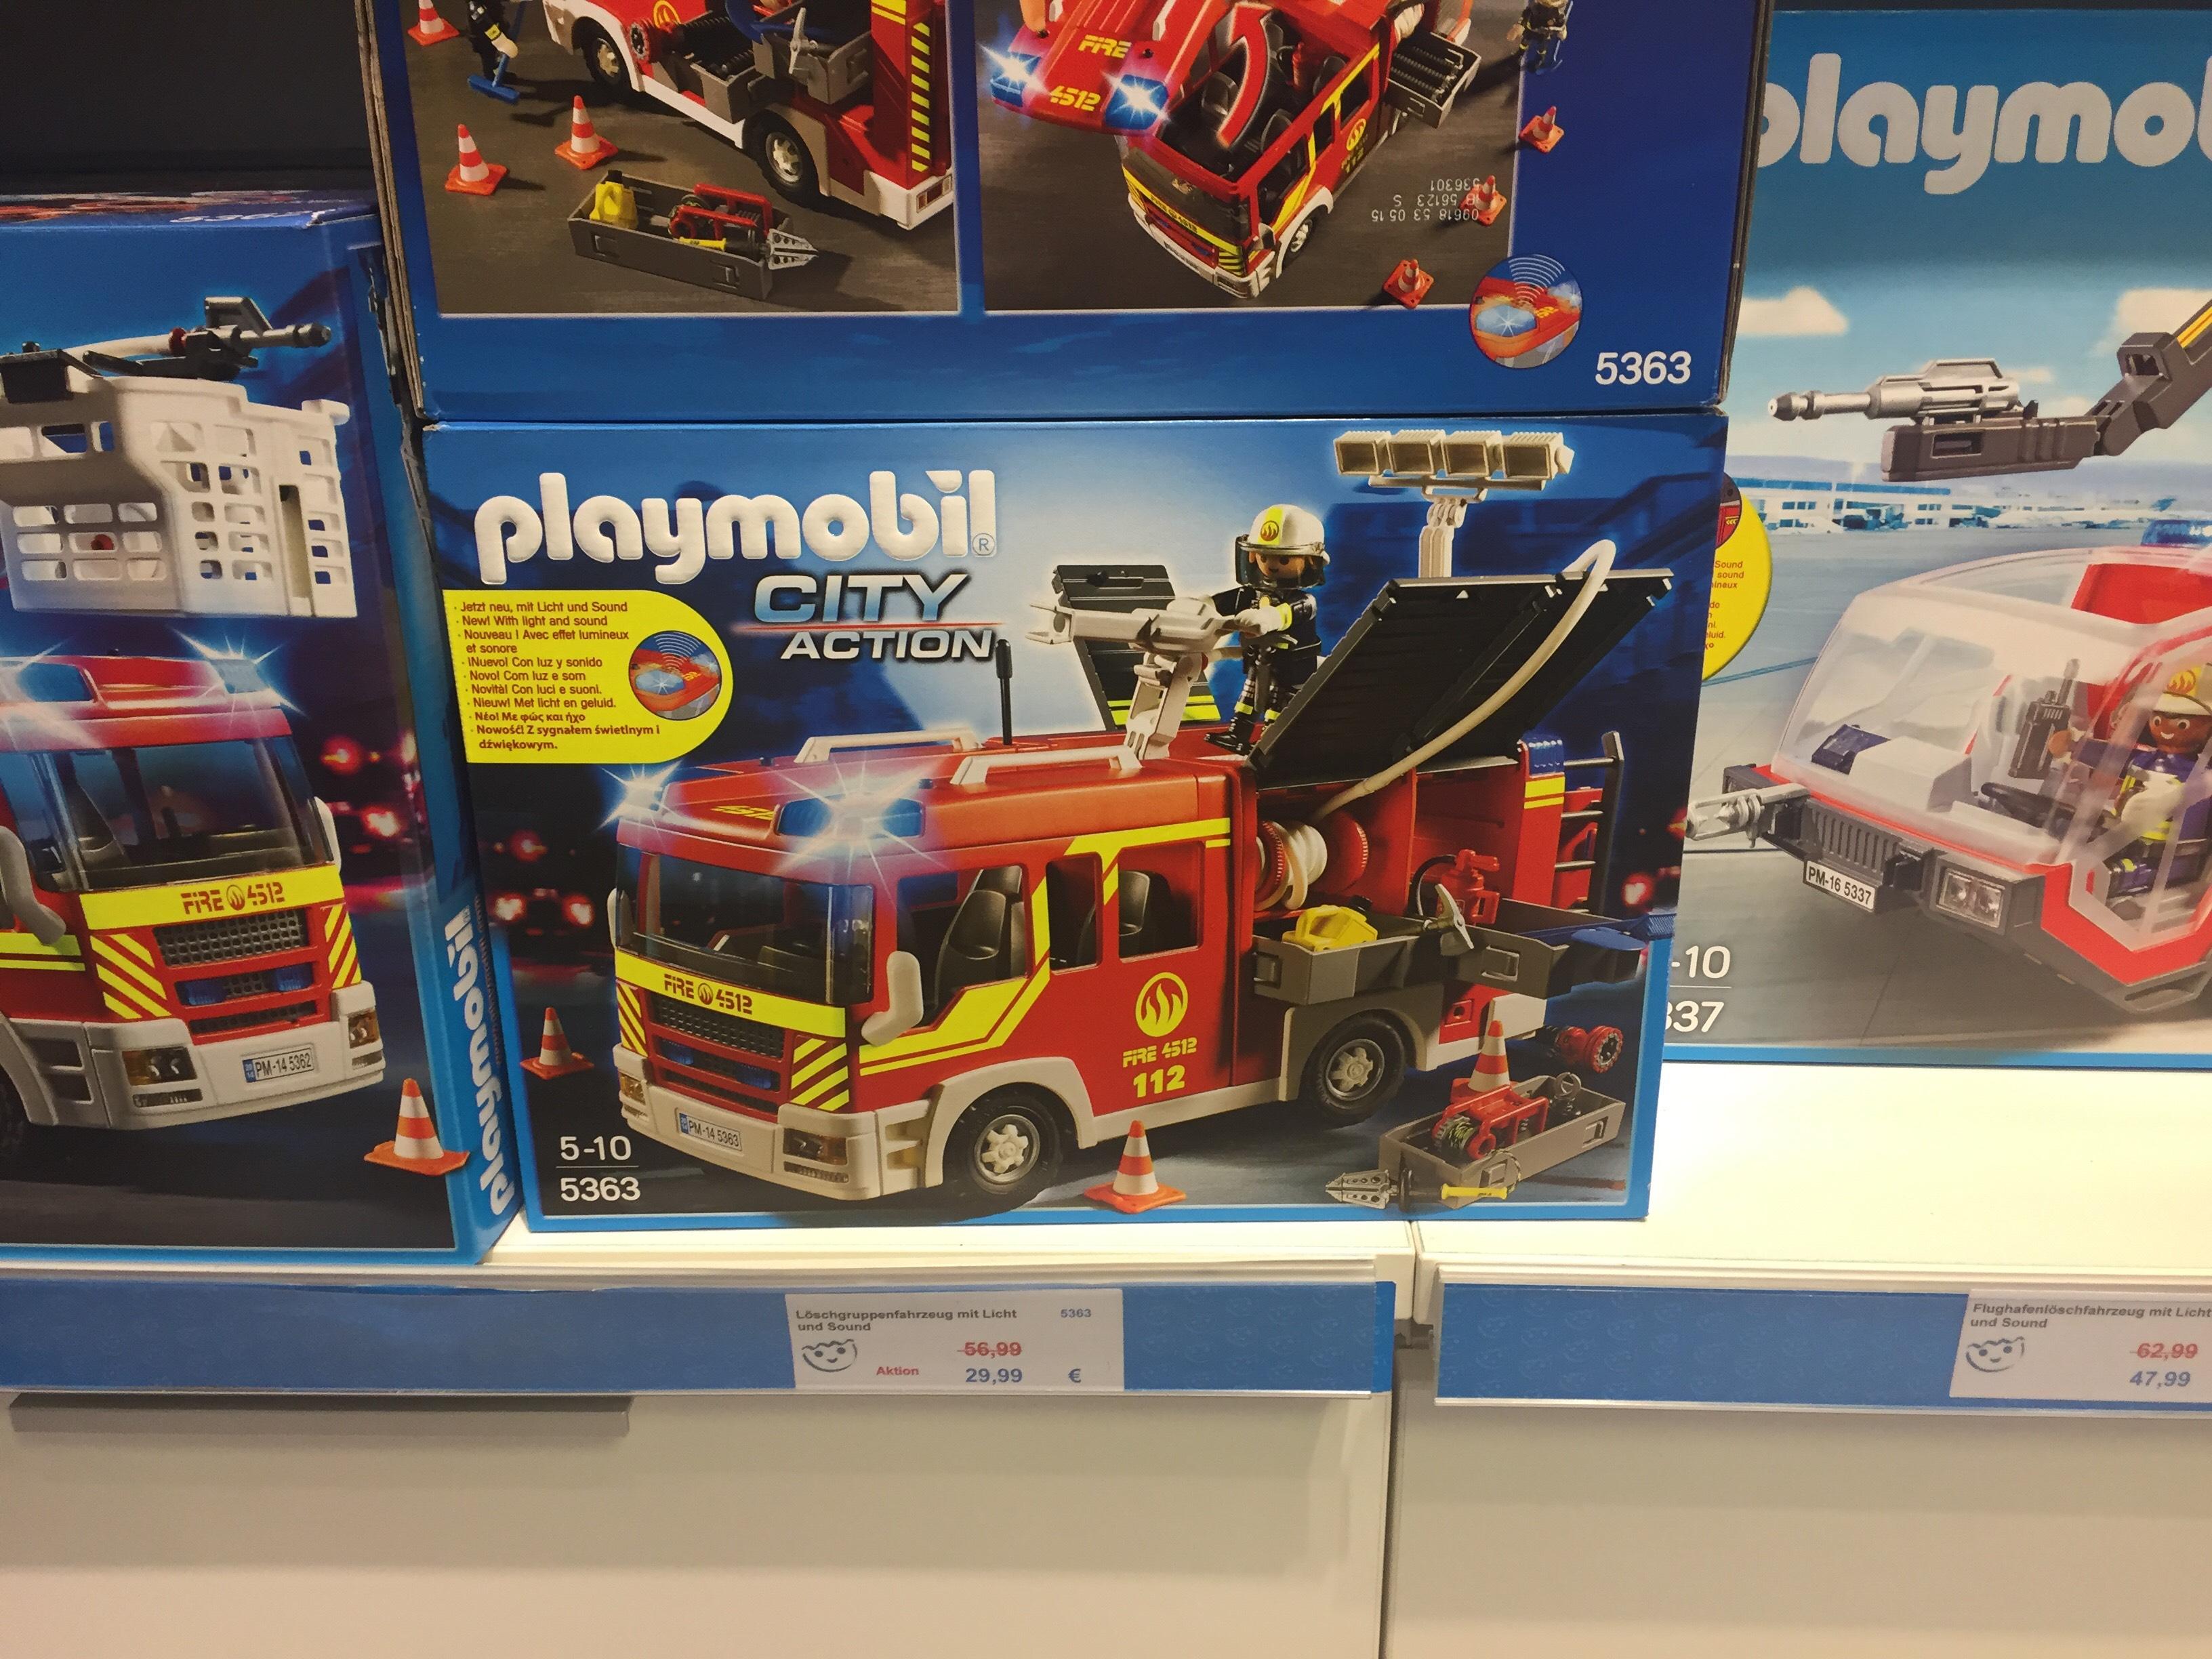 (Lokal) Düsseldorf Arcaden: Playmobil Löschgruppenfahrzeug (5363) für 29,99